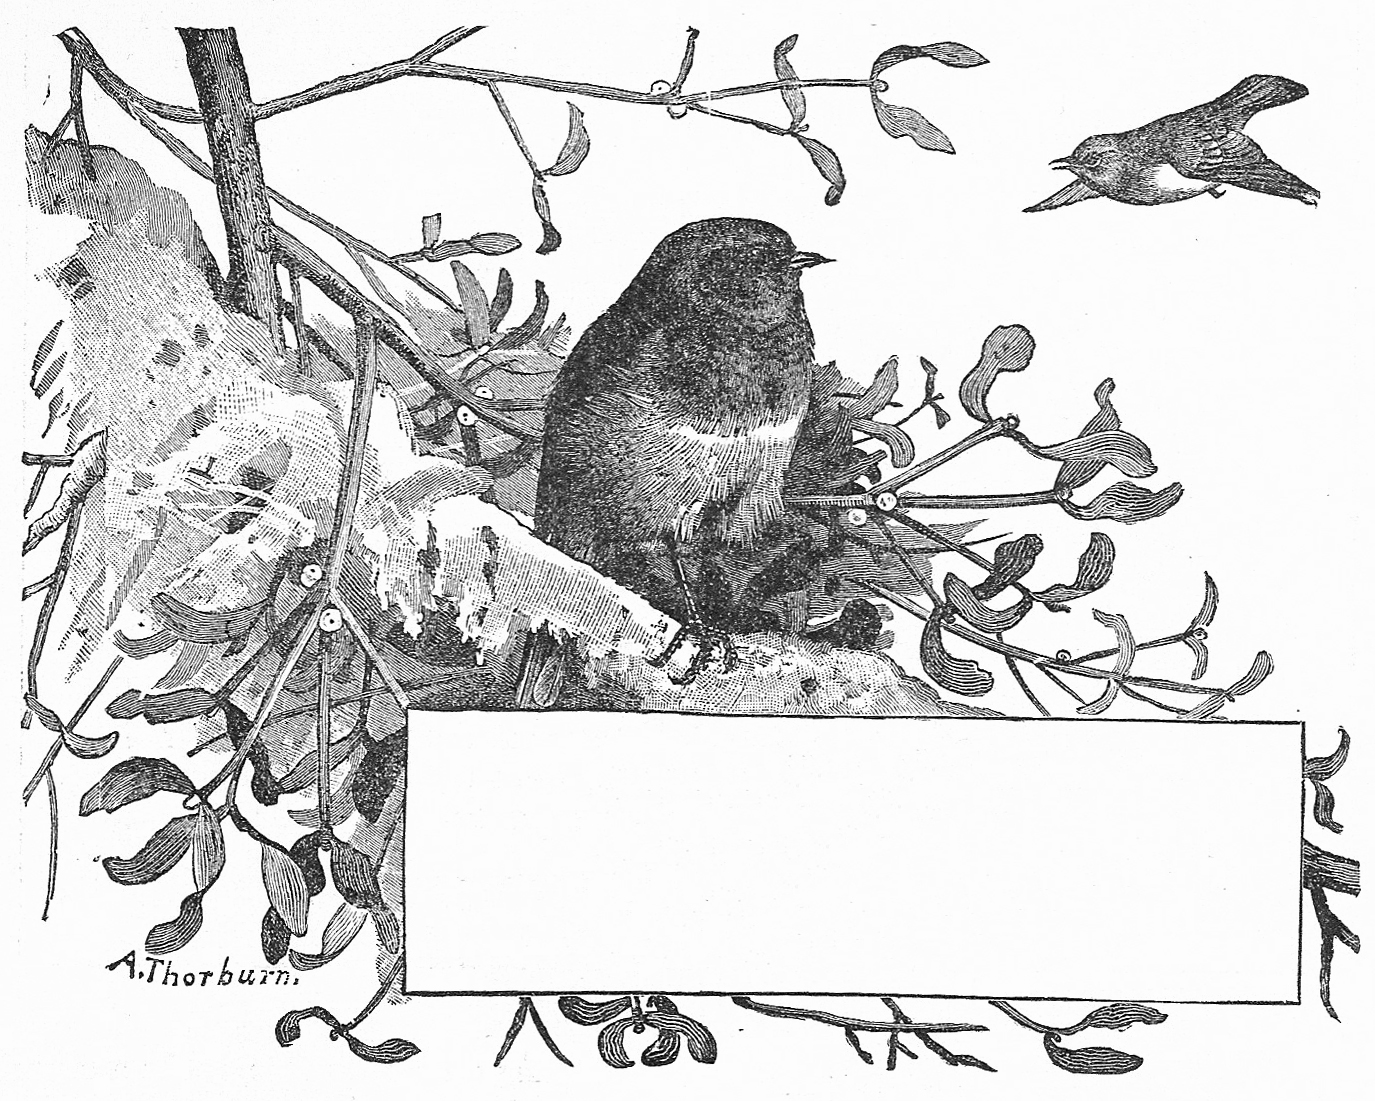 Catnipstudiocollage Free Vintage Clip Art